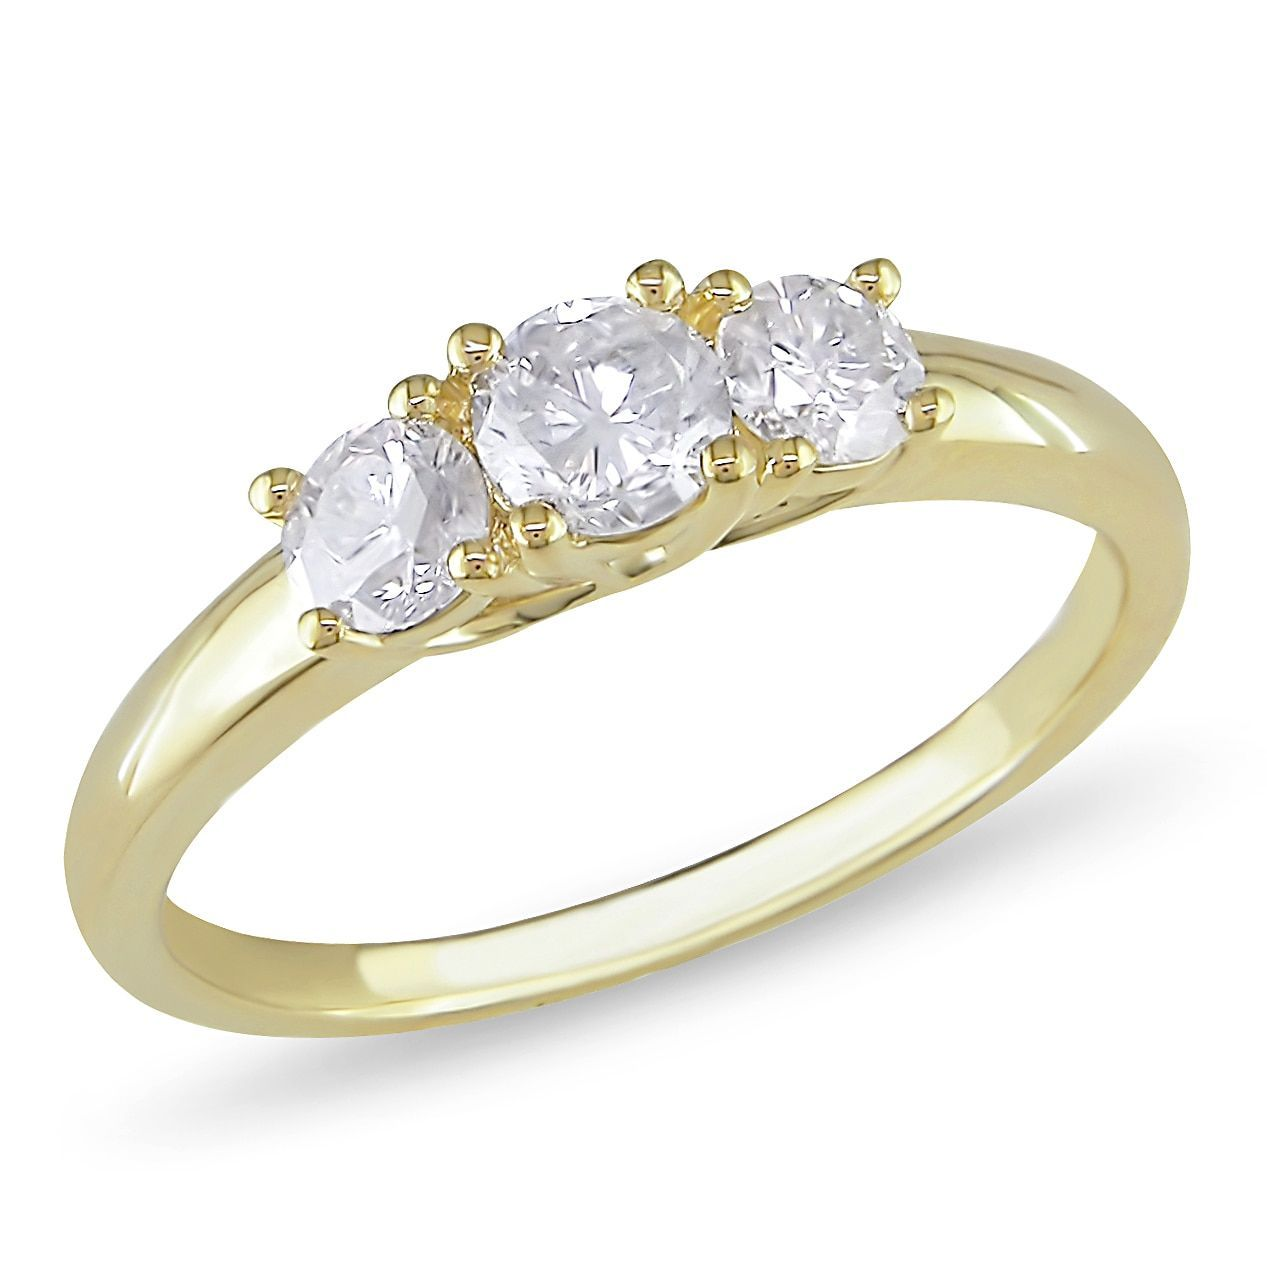 Miadora 10k Gold 3/4ct TDW Diamond Three Stone Ring